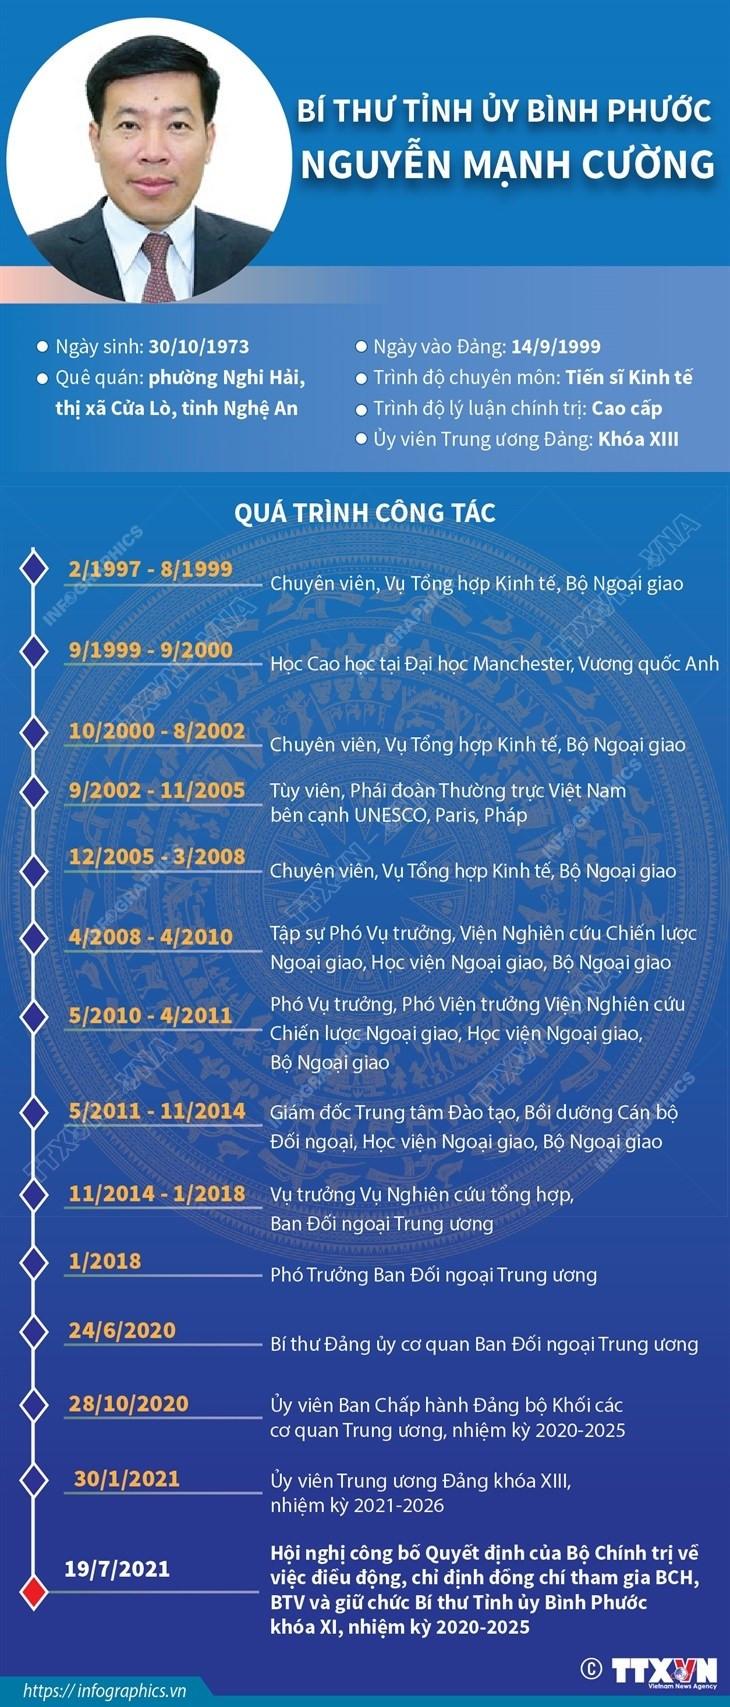 [Infographics] Bi thu Tinh uy Binh Phuoc Nguyen Manh Cuong hinh anh 1